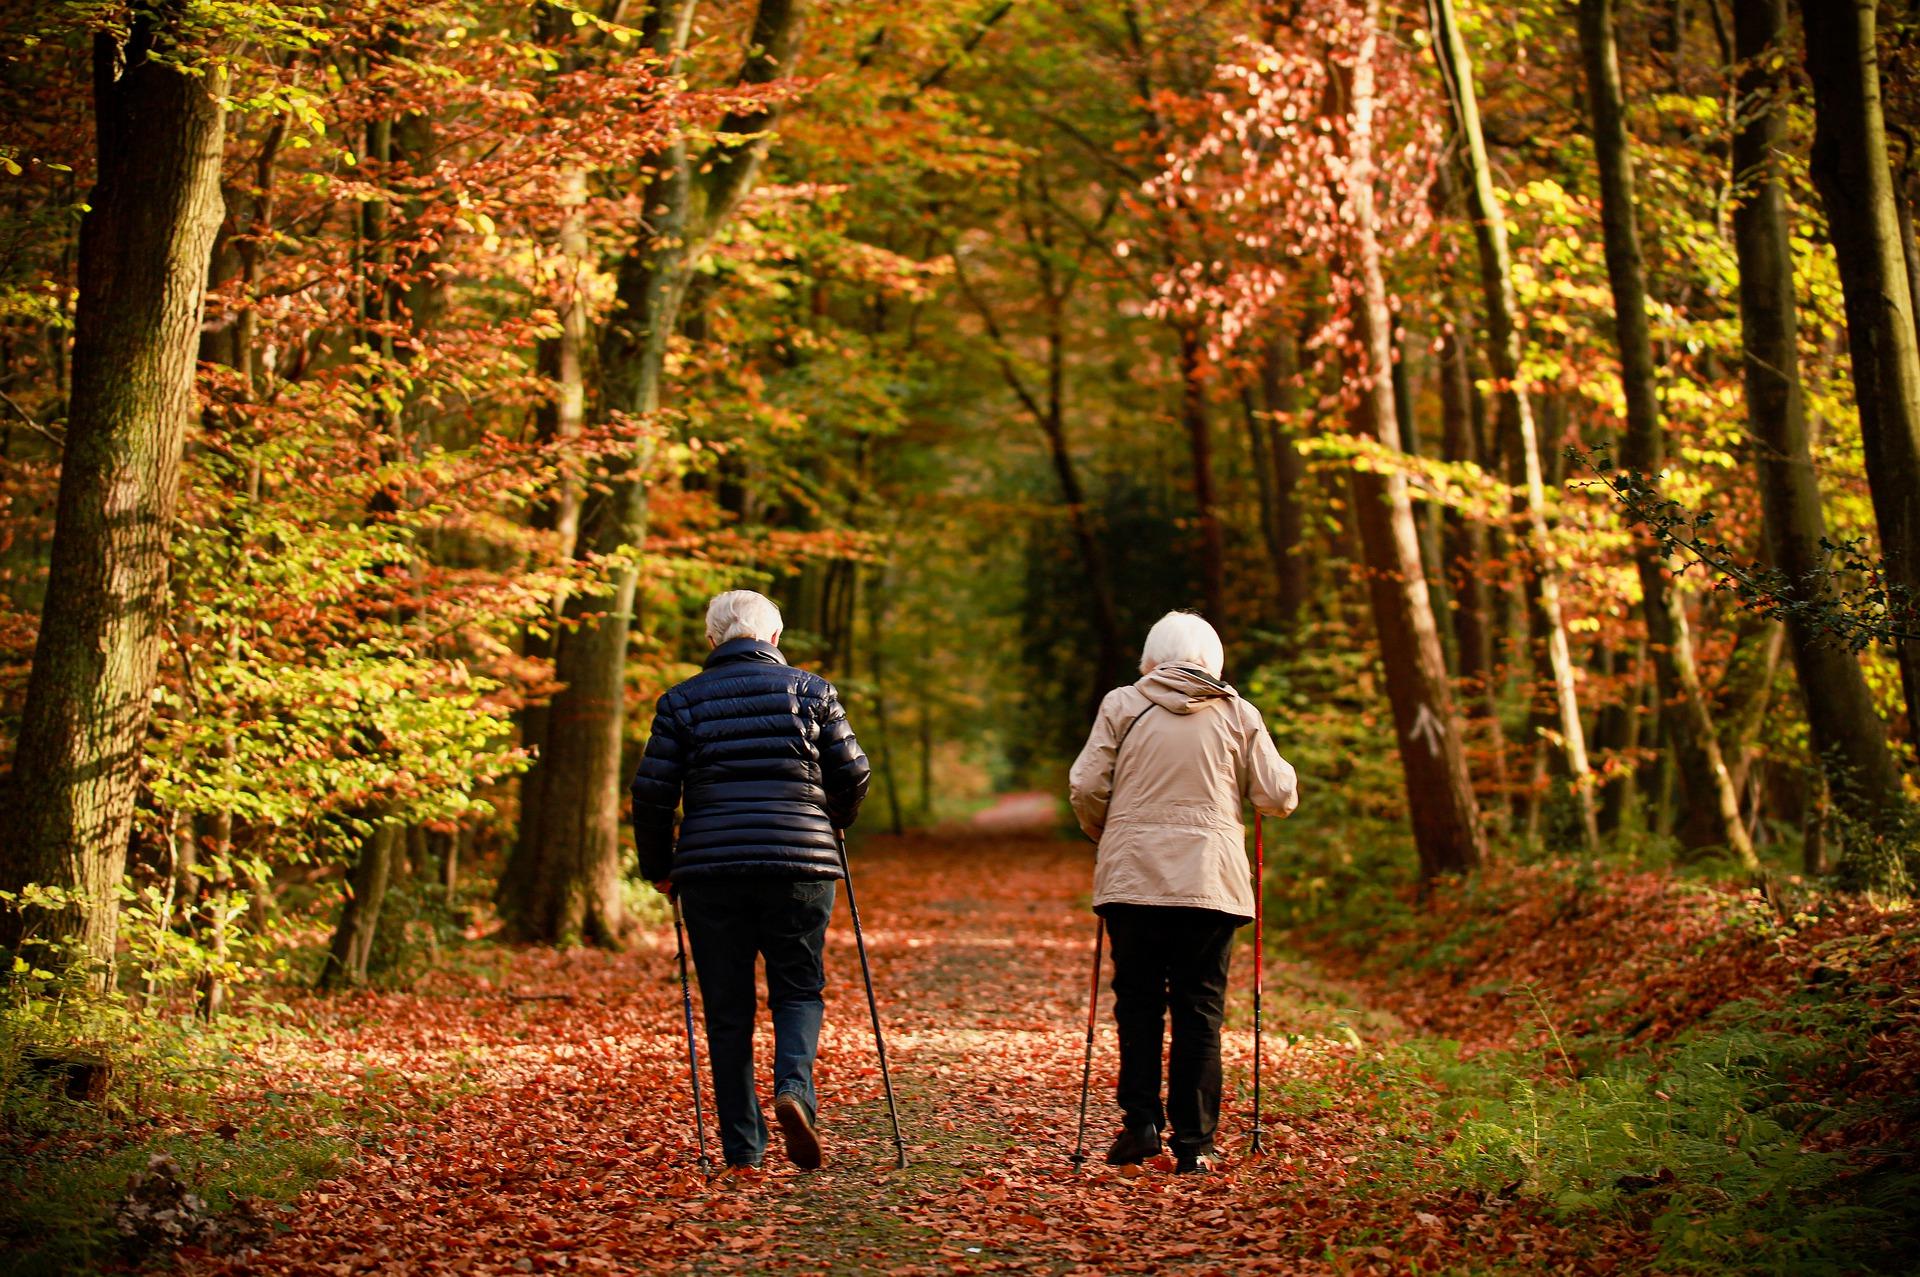 Elderly People 5775209 1920